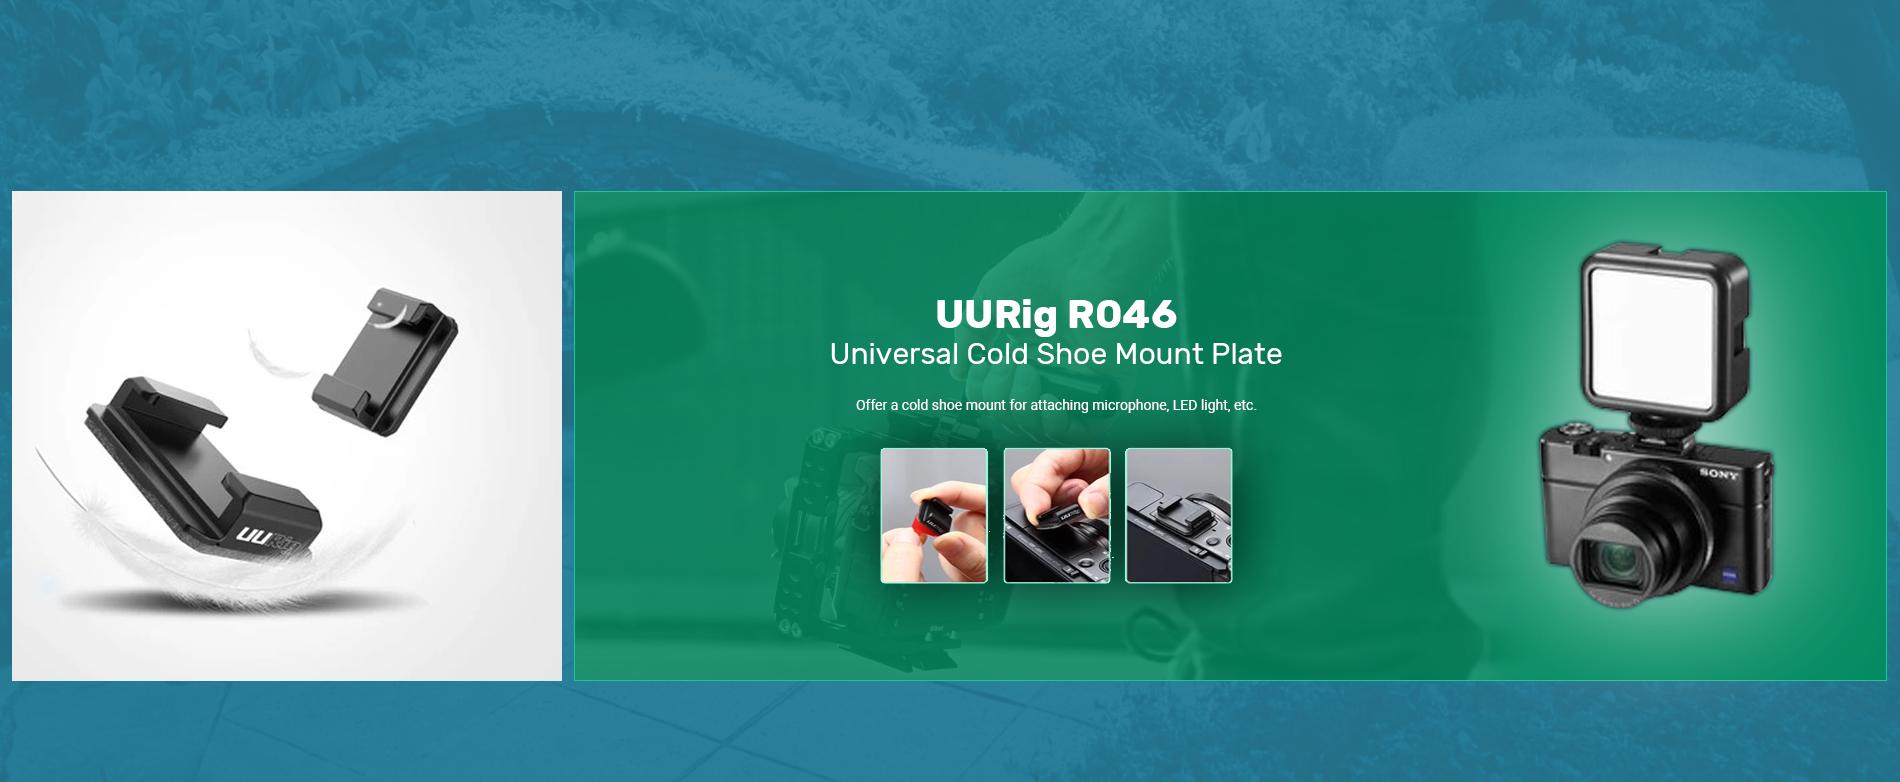 UURig R046 Universal ...